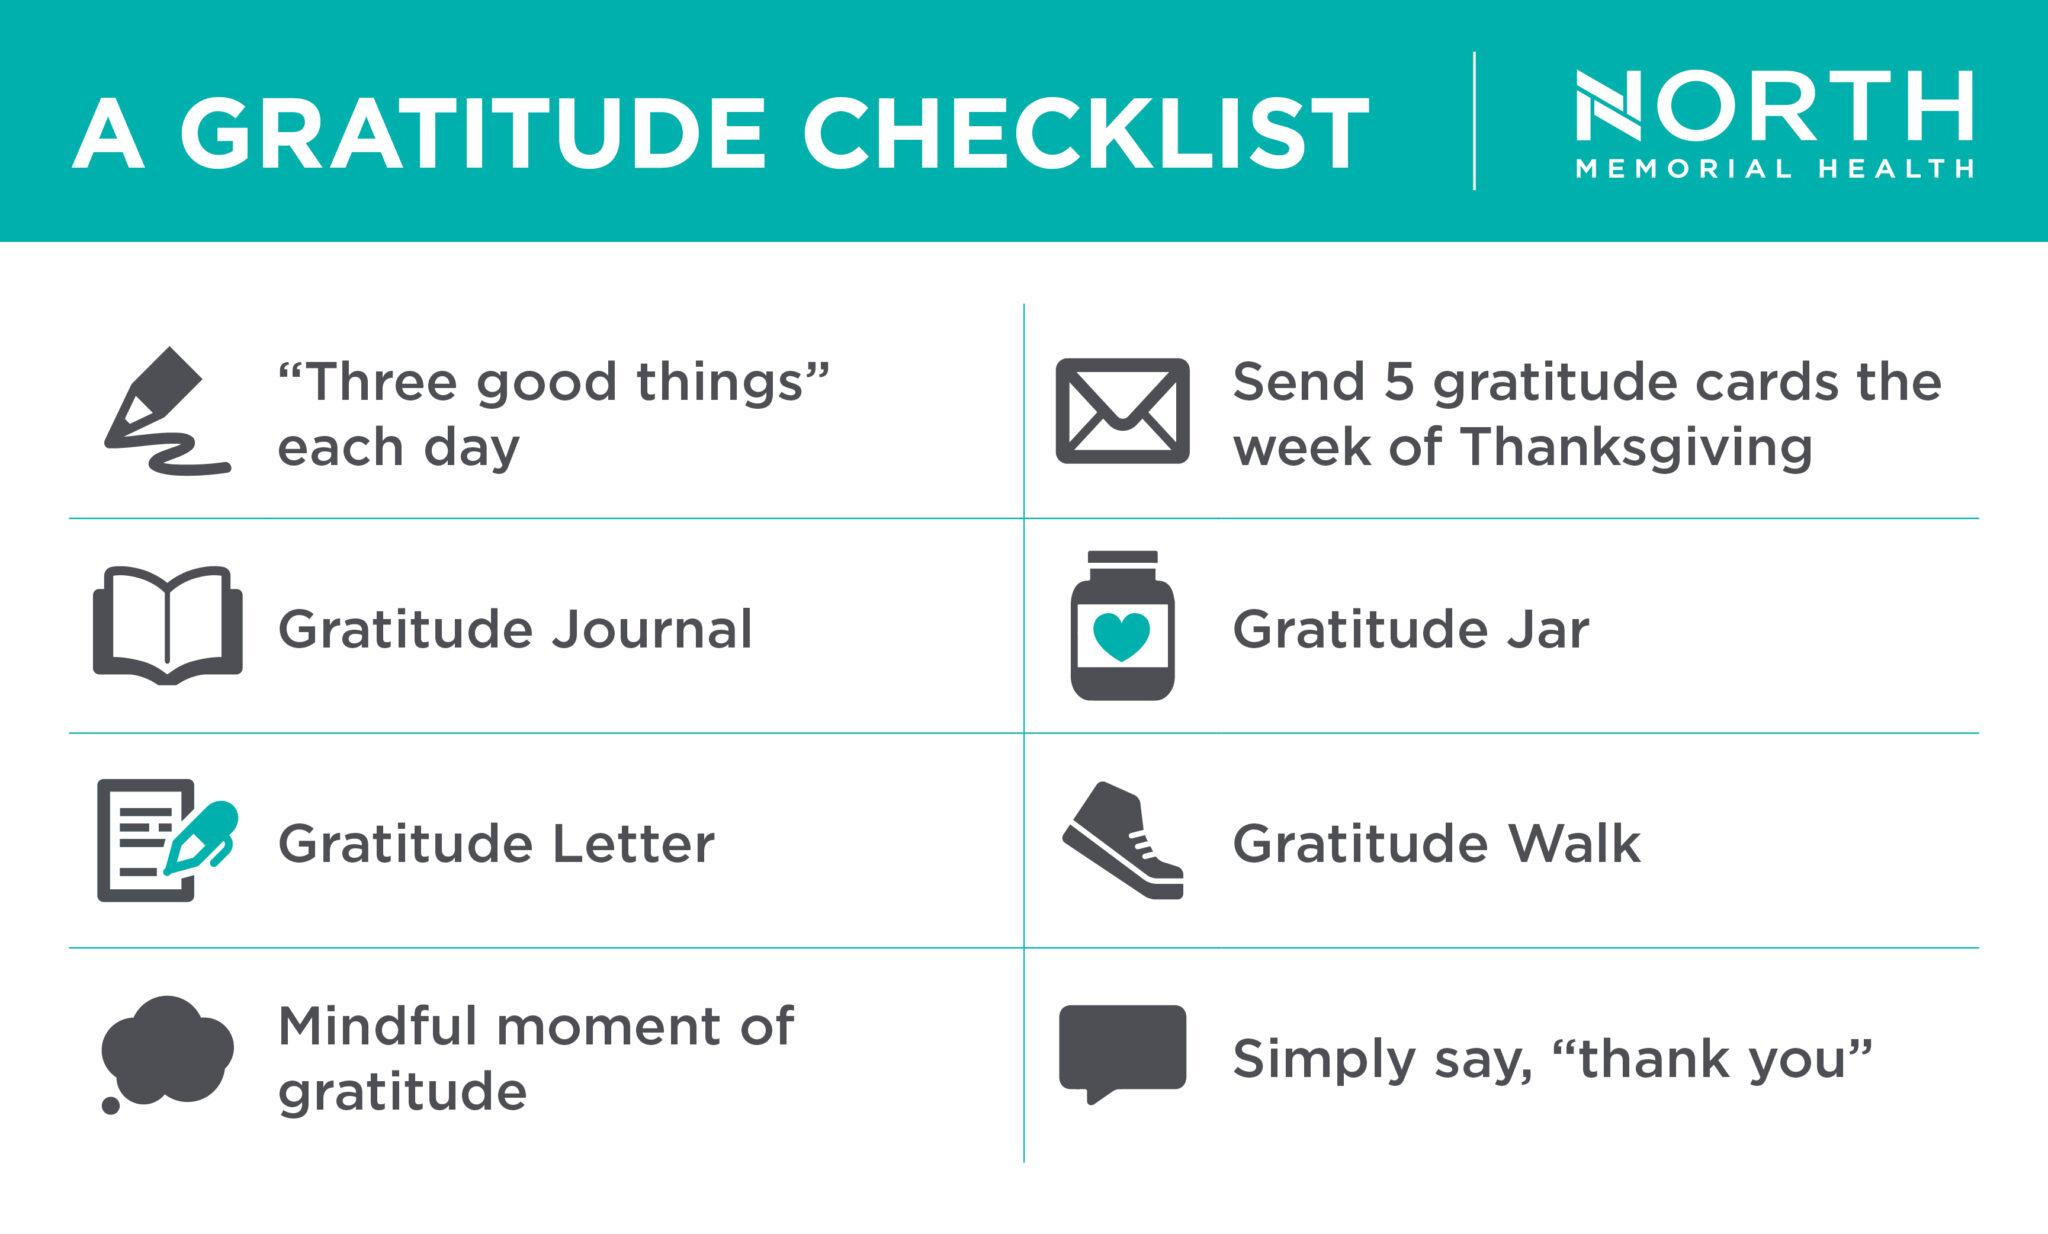 a gratitude checklist